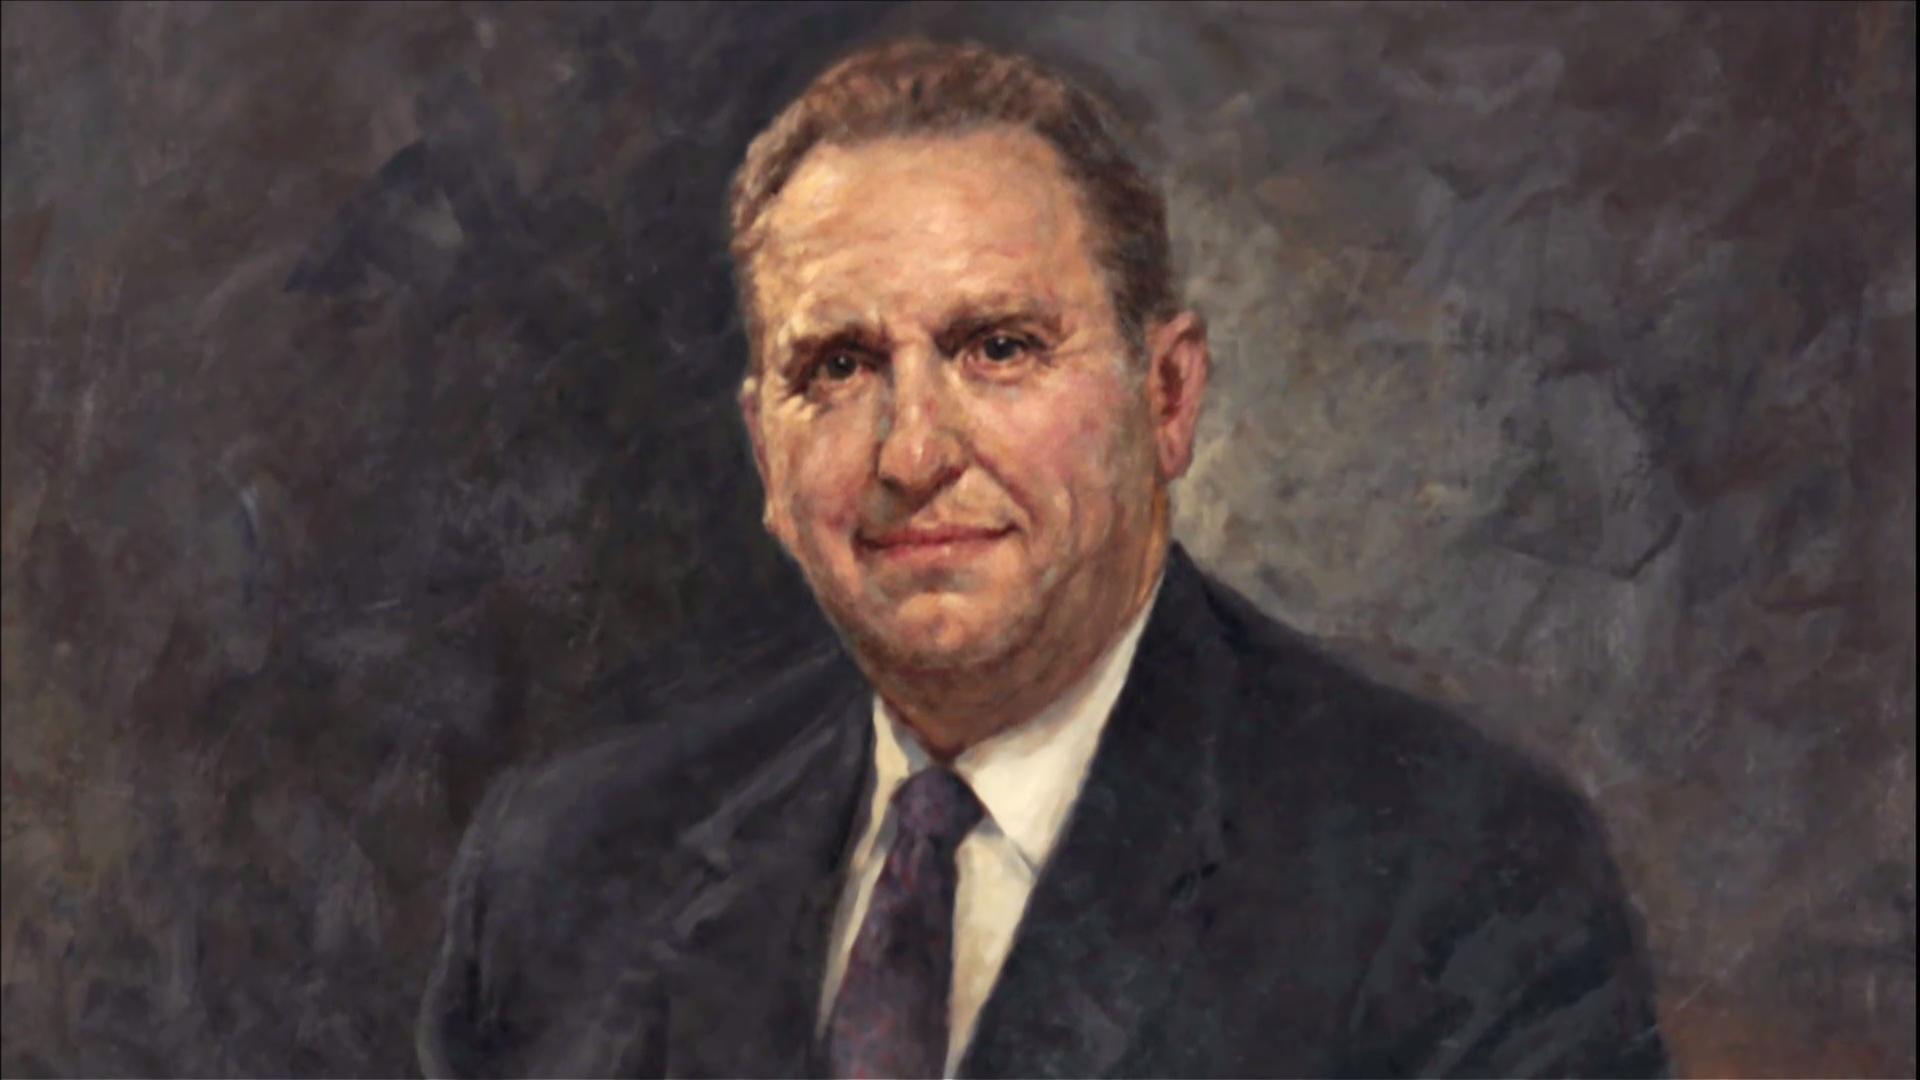 homenaje al presidente Monson